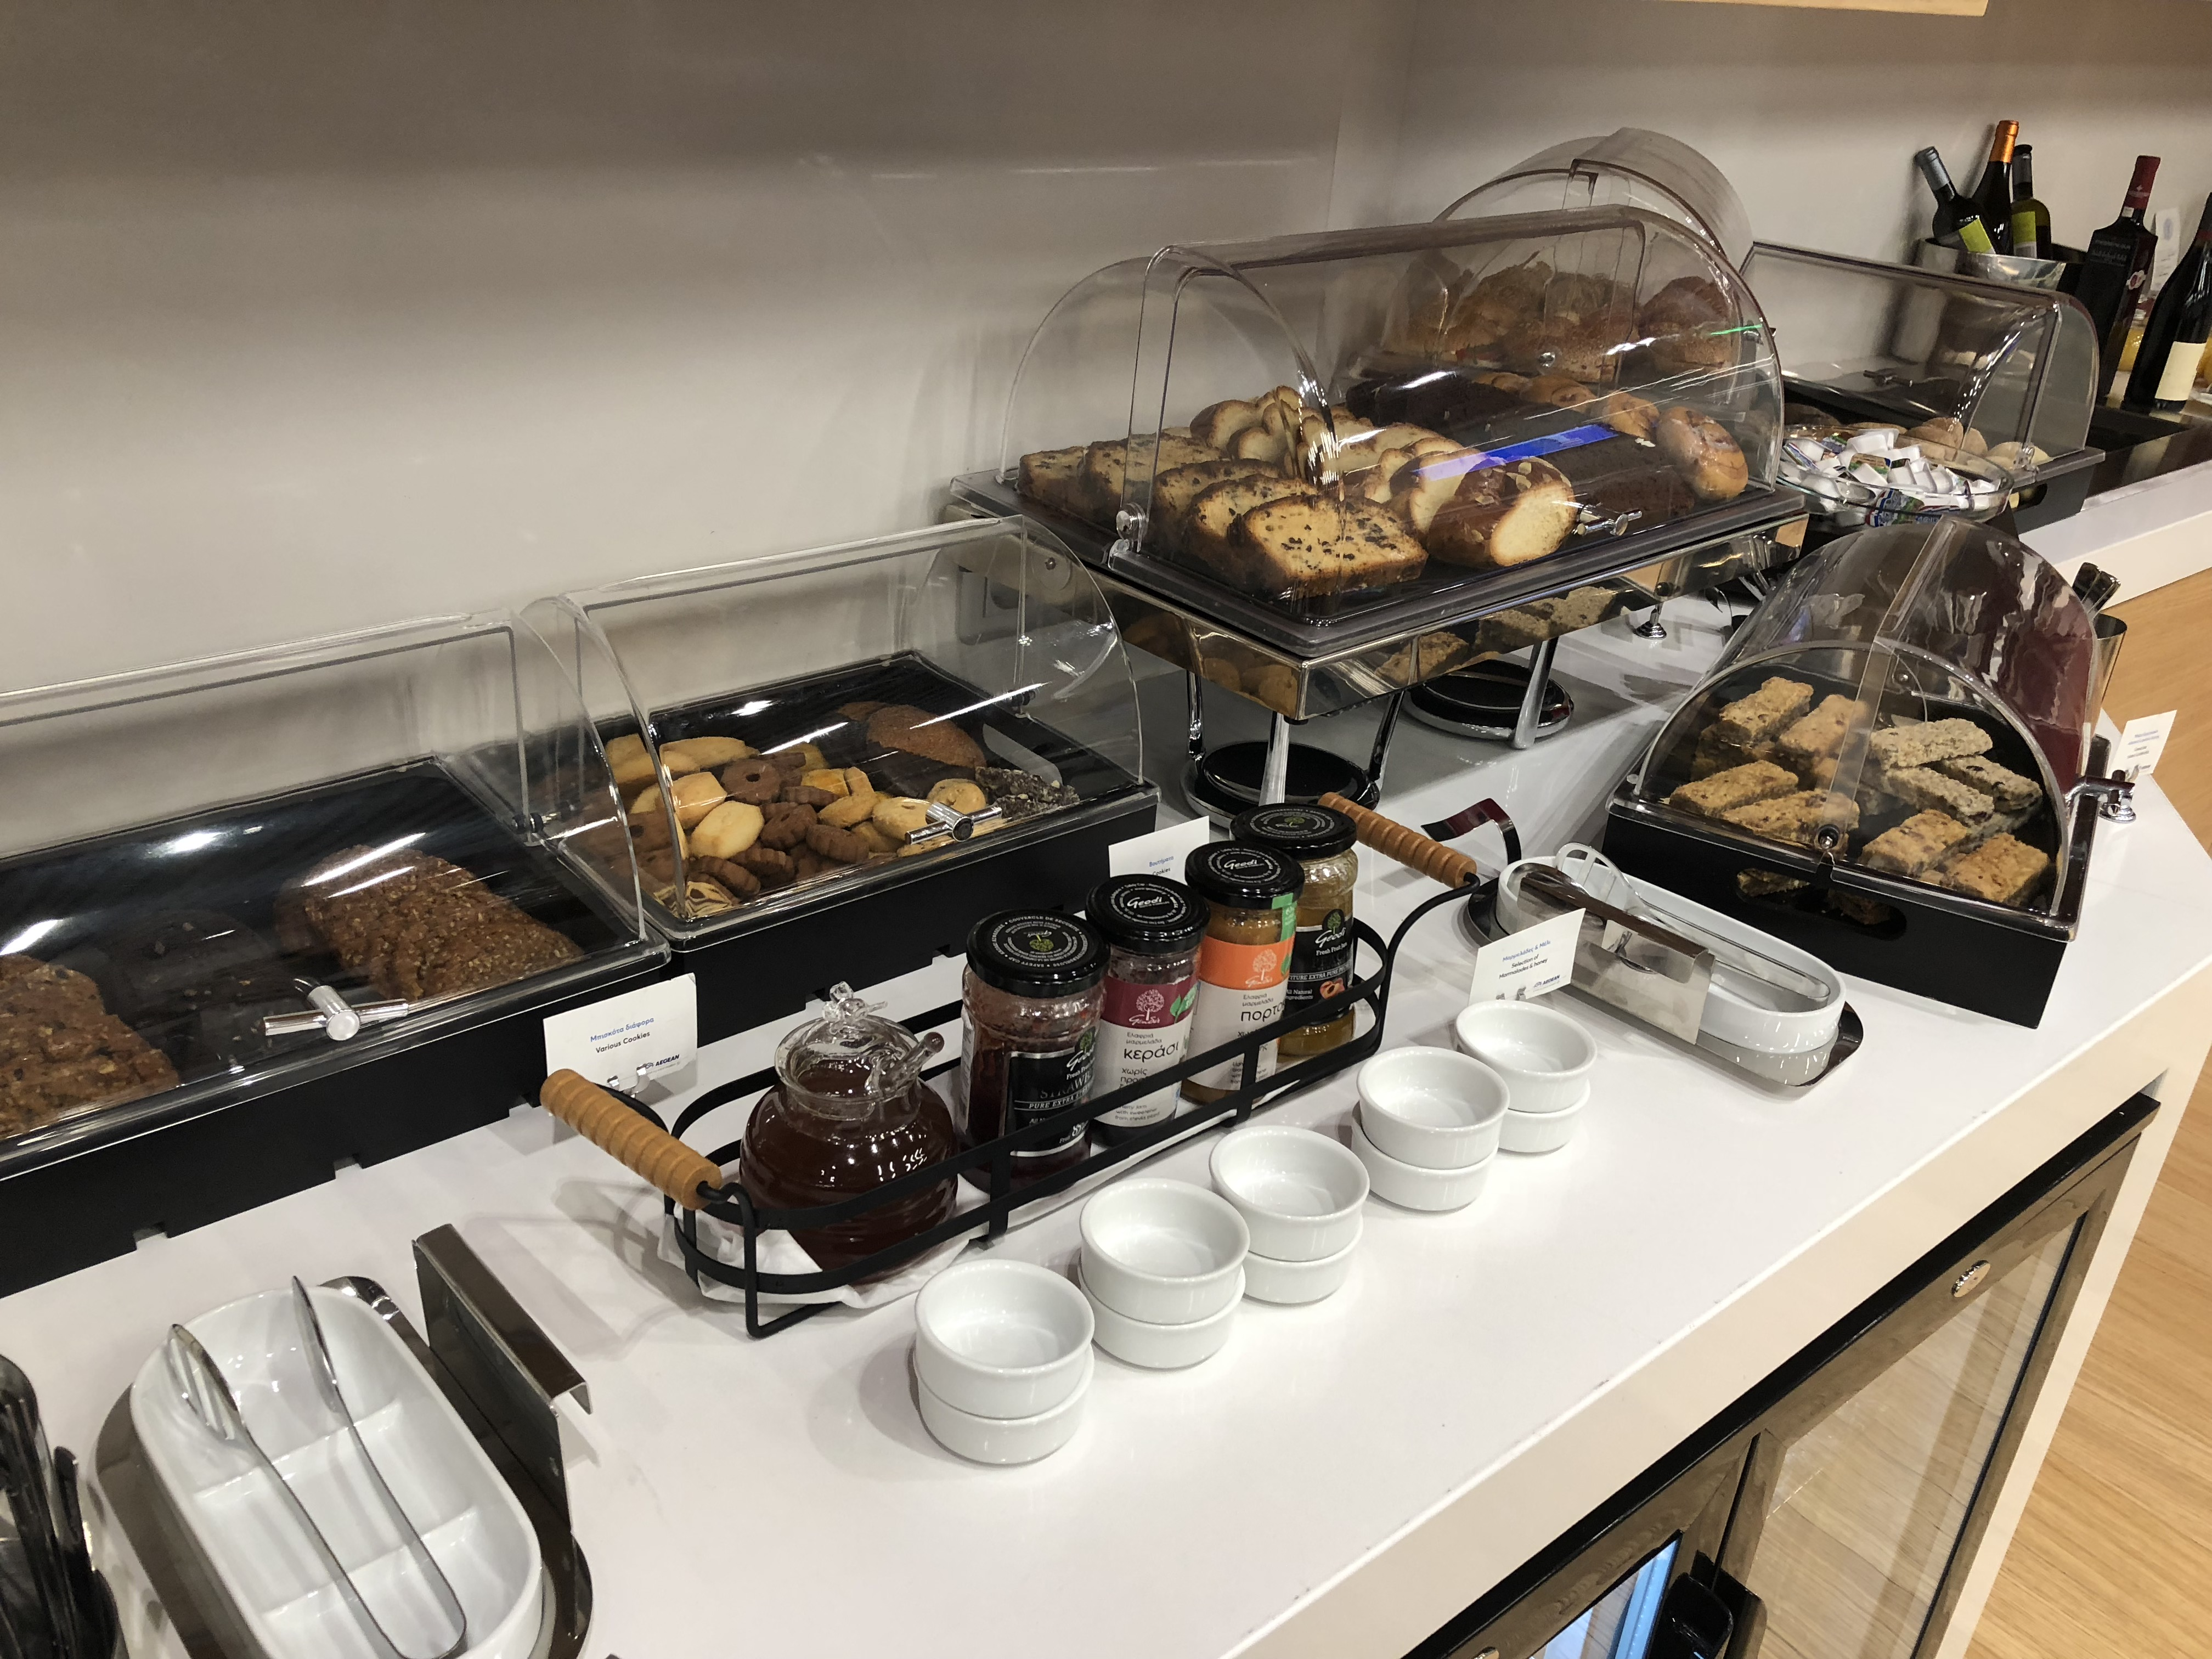 Kuchen, Kekse, Marmelade